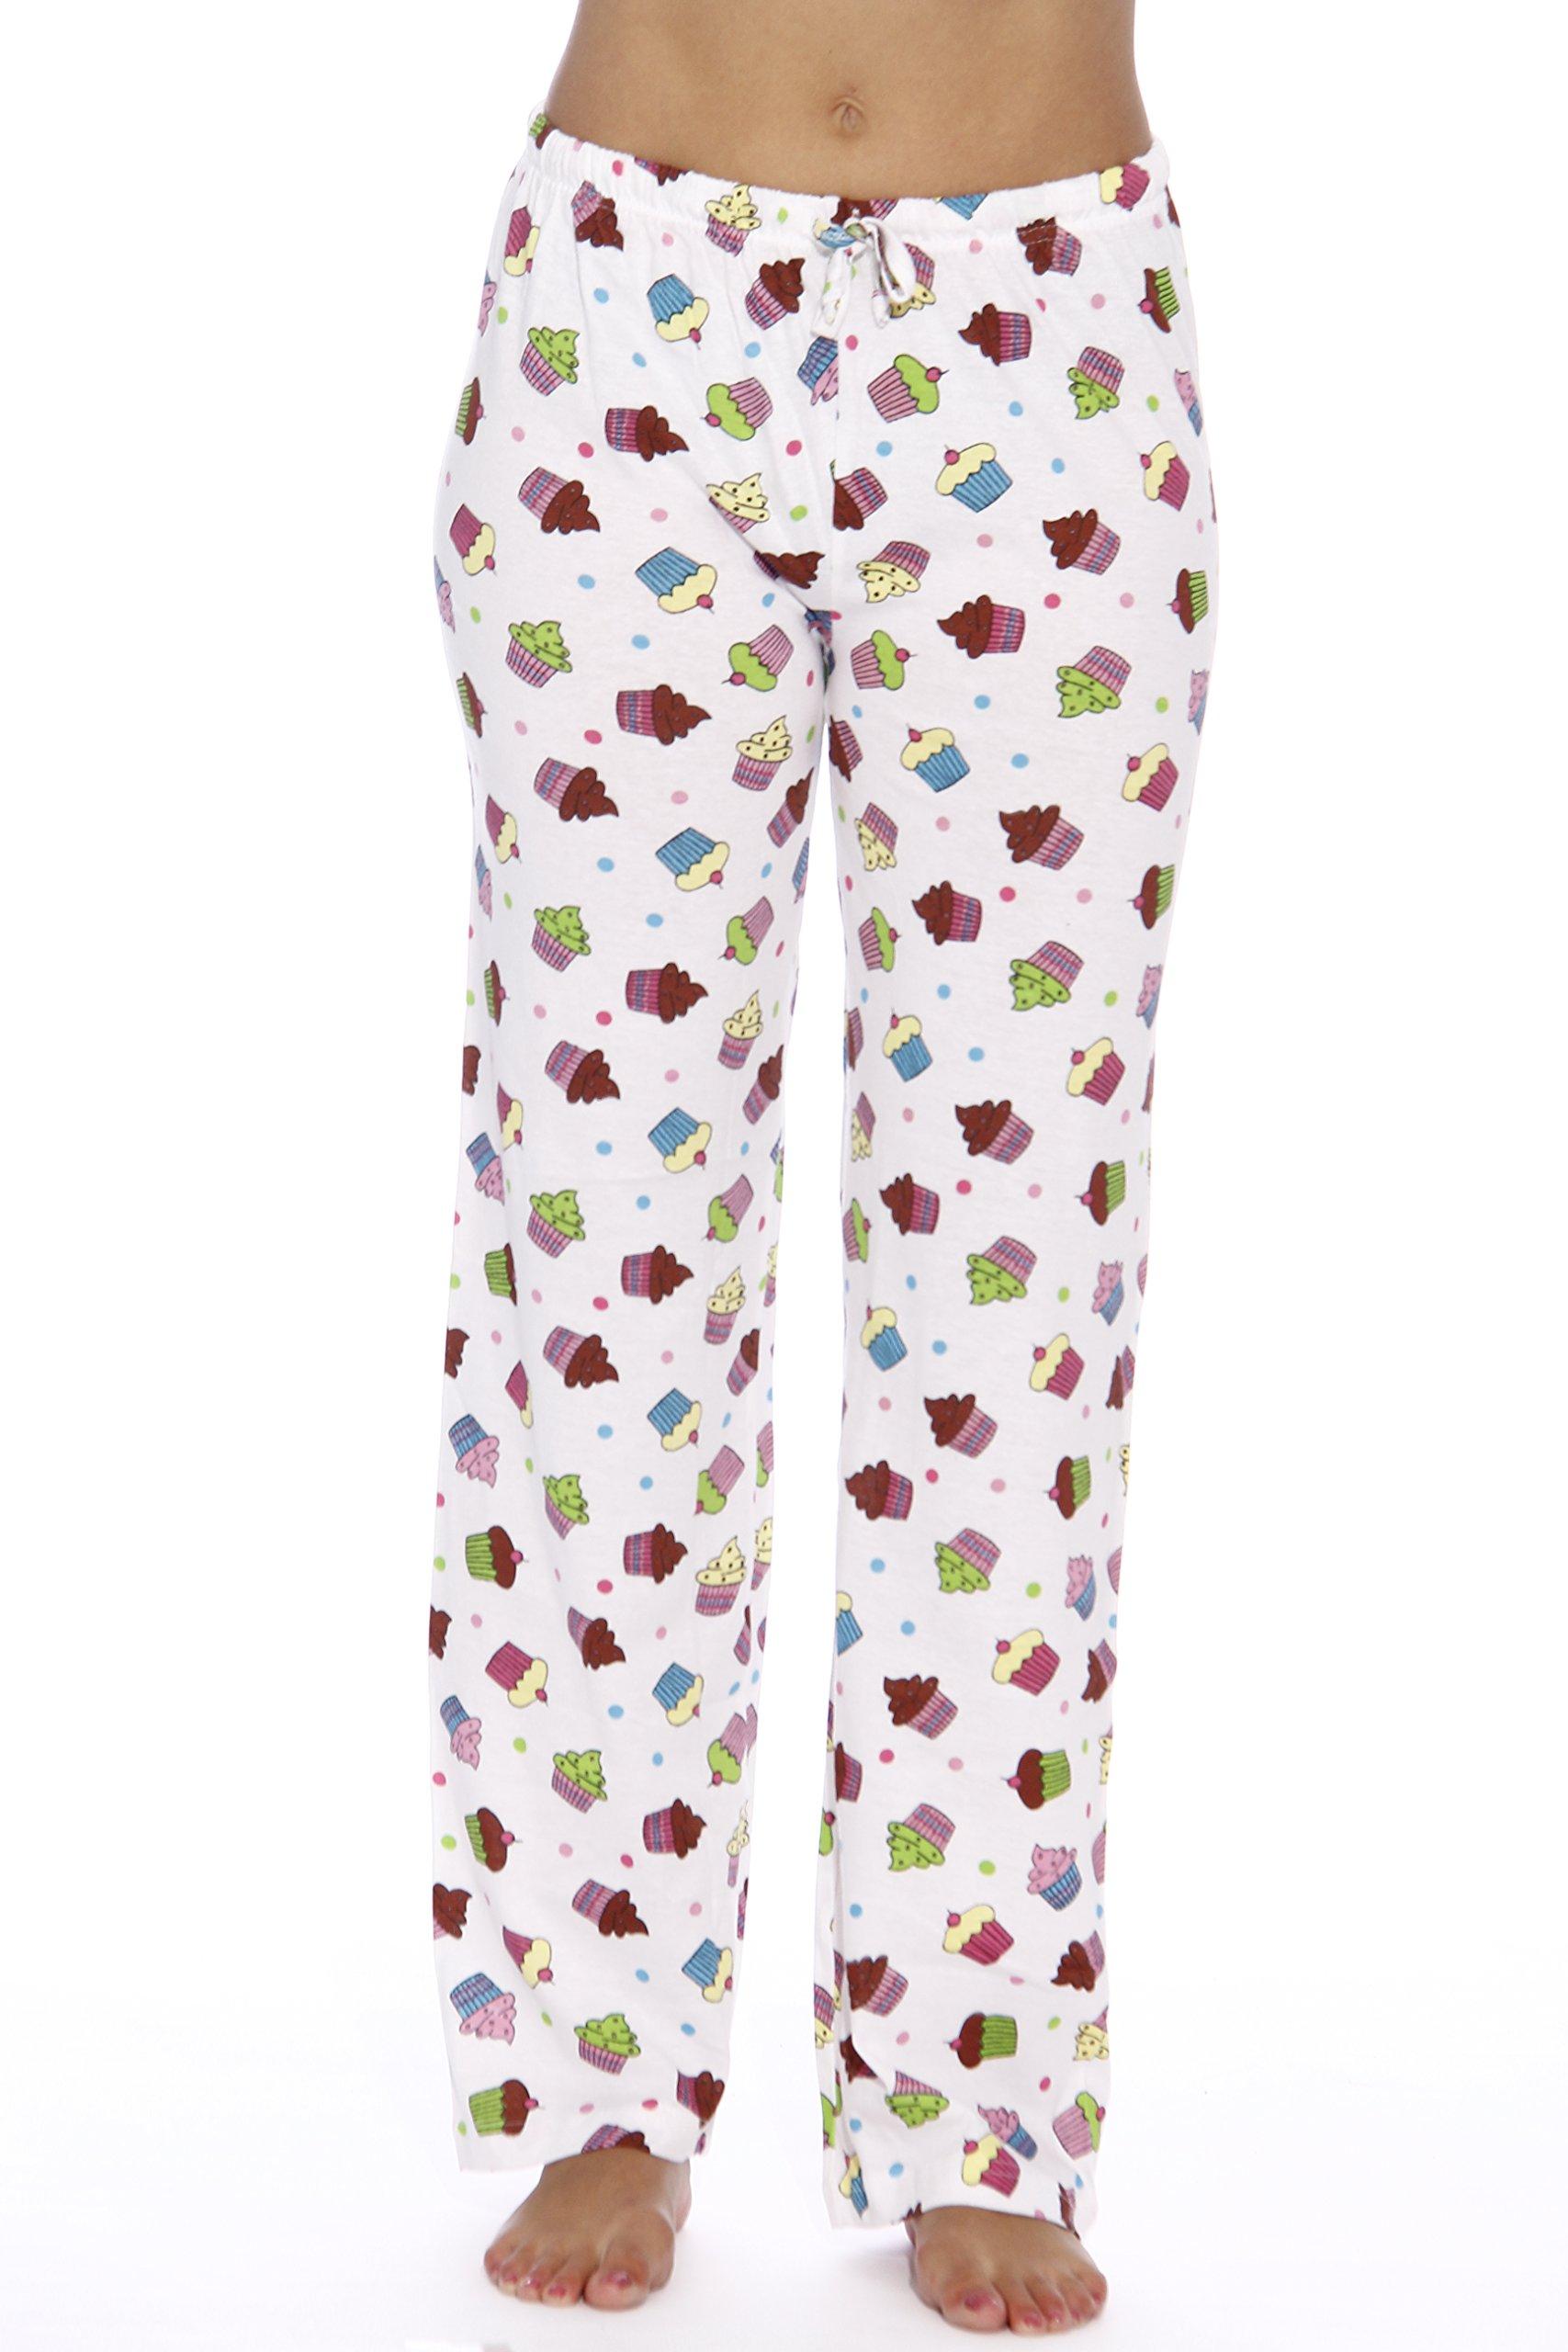 Just Love 100% Cotton Jersey Knit Fun Print Women Pajama Pants Sleepwear, Cupcake White, 2X Plus